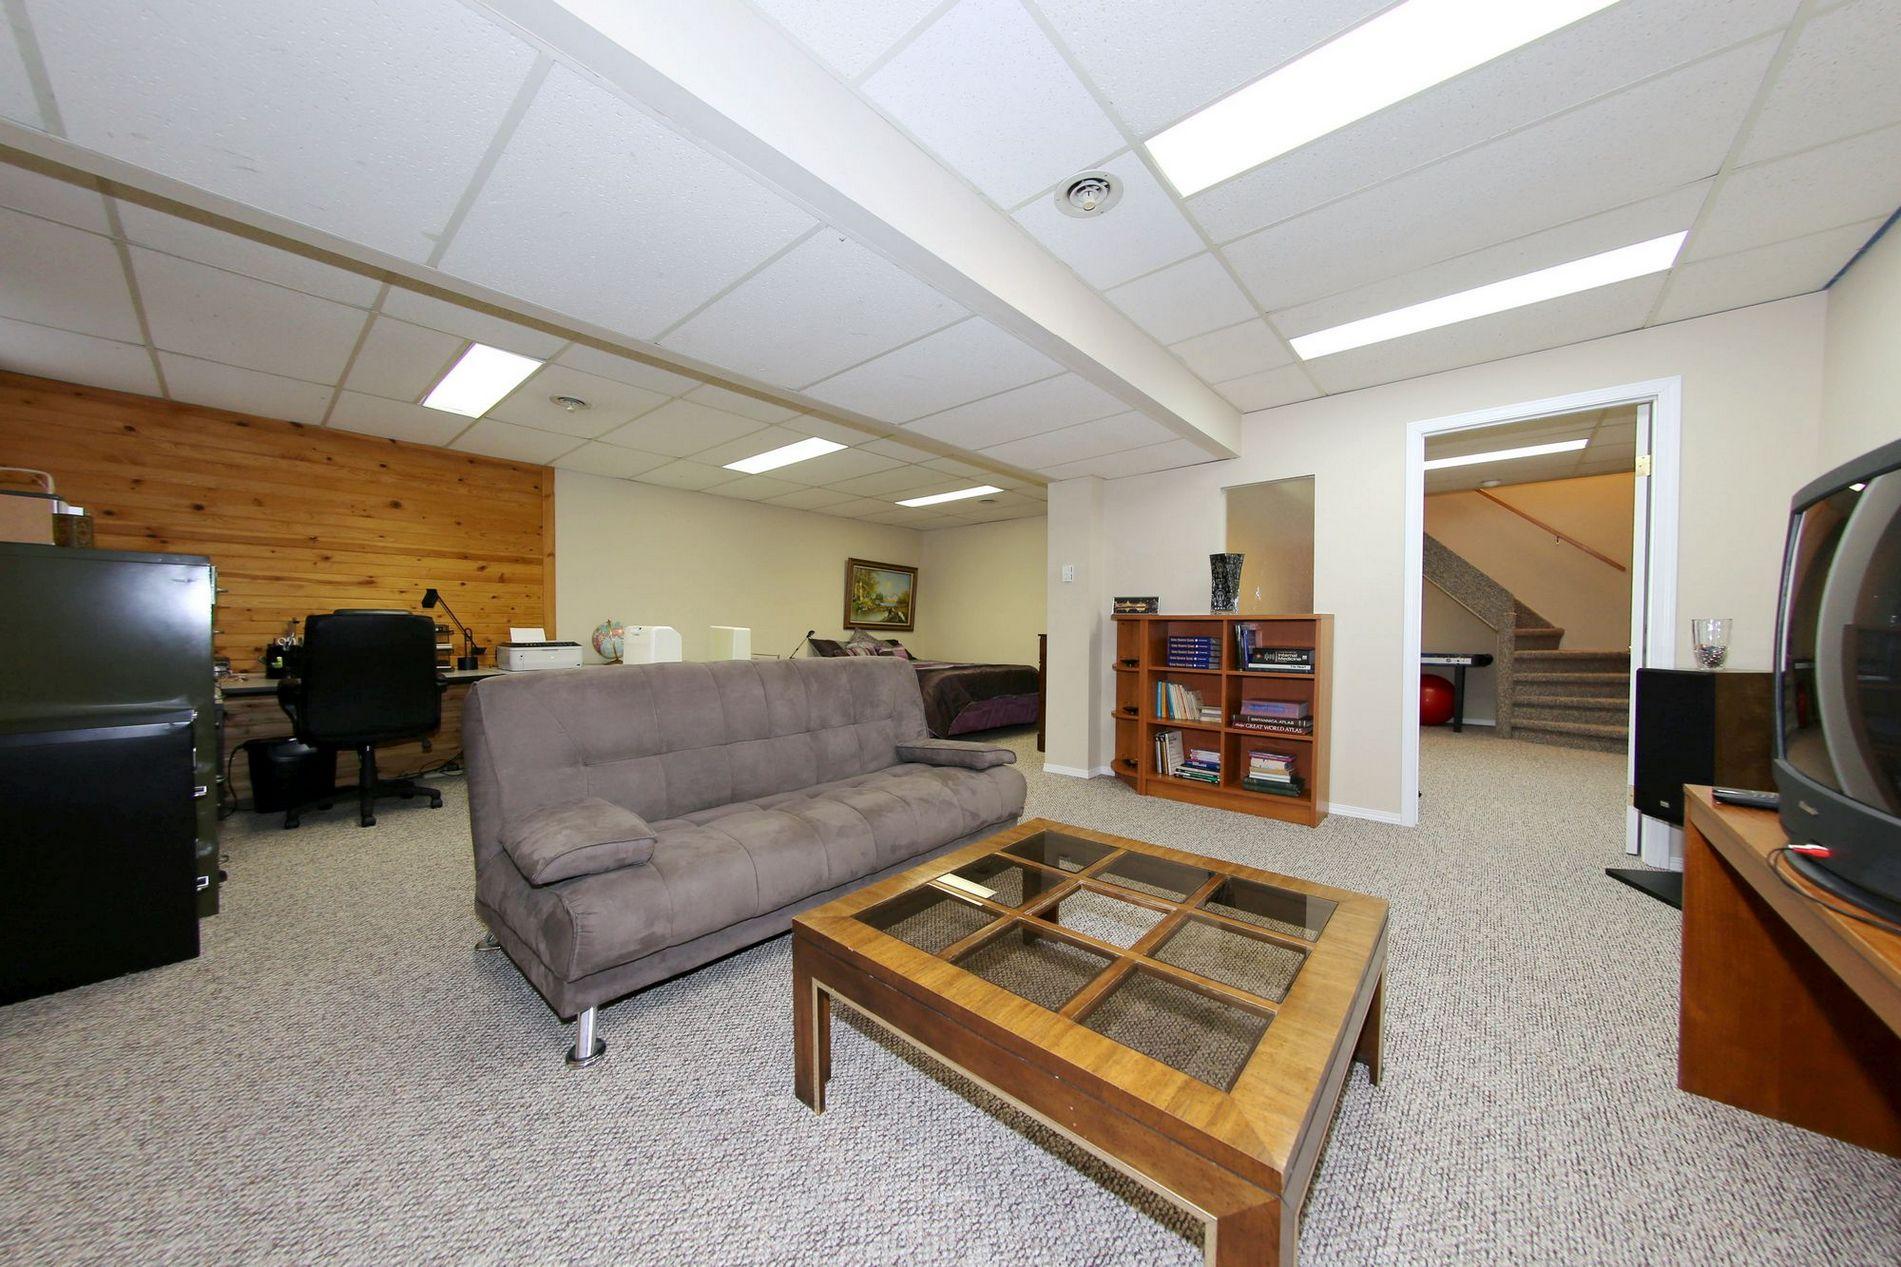 6383 Southboine Drive, Winnipeg, Manitoba  R3R 0B7 - Photo 24 - 1504061